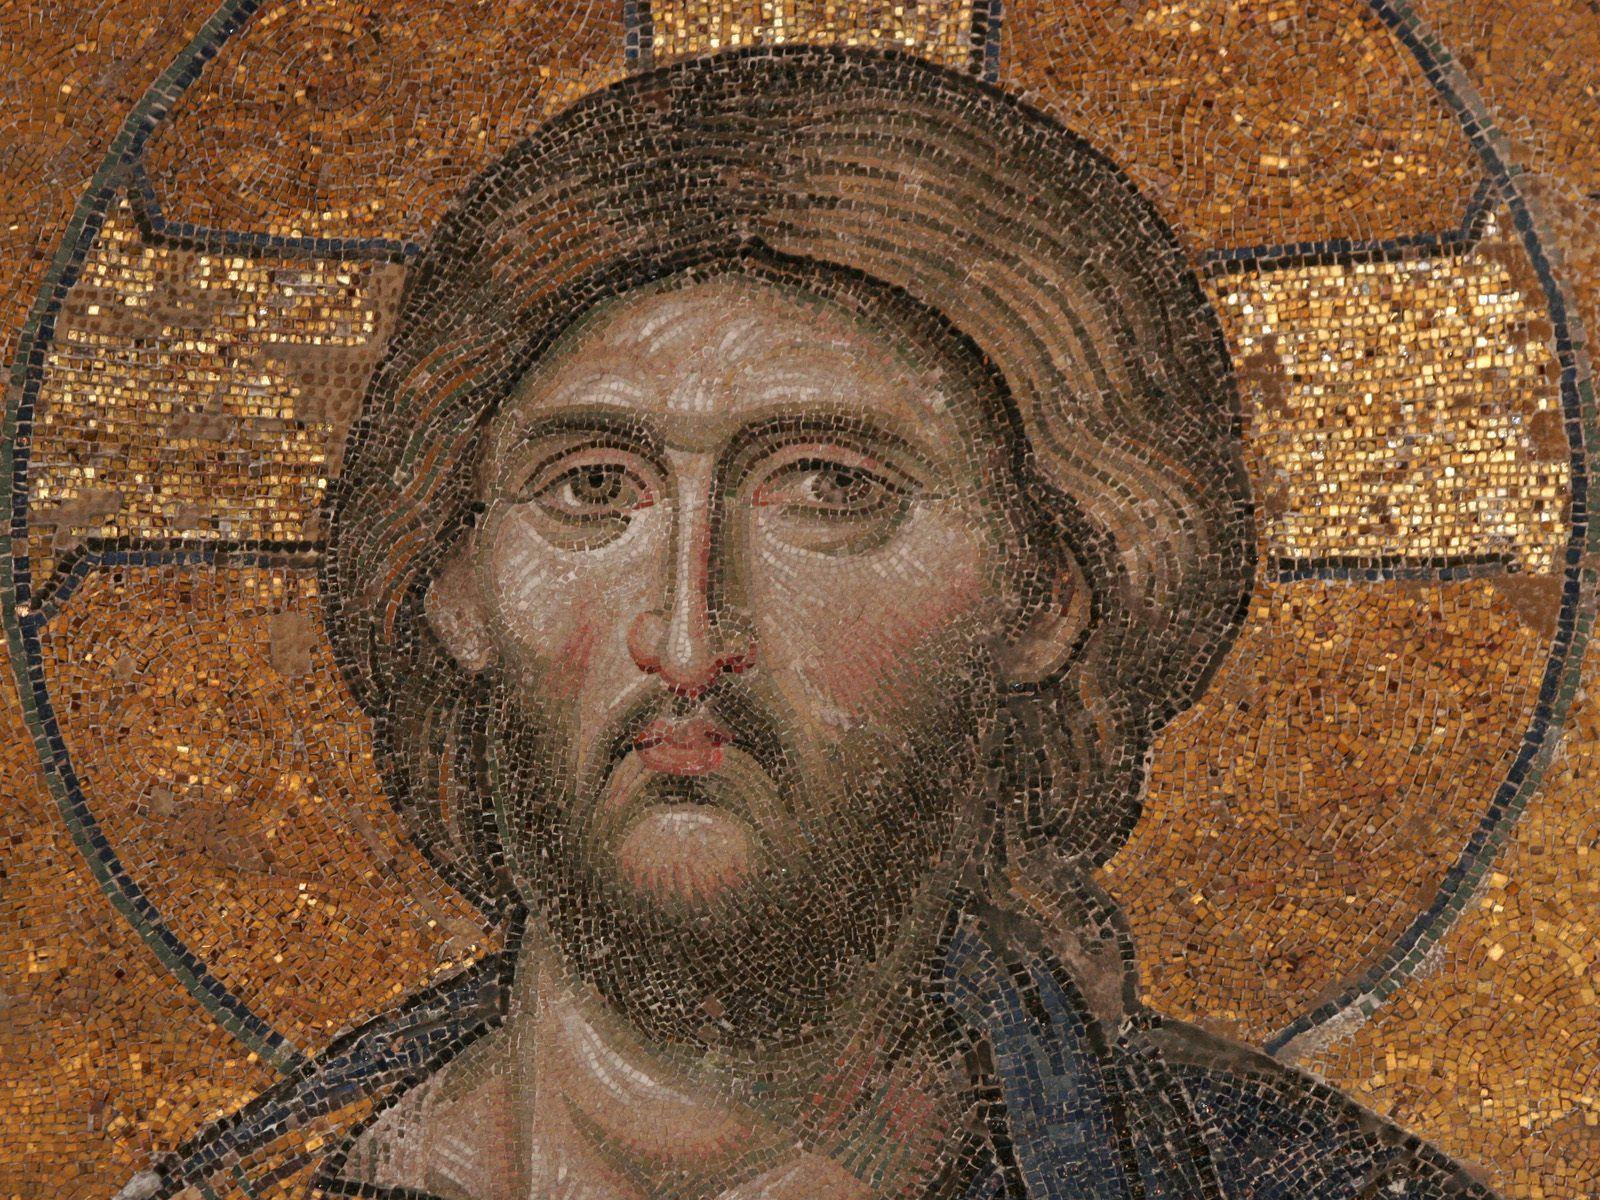 Christ, detail from the 13th Century Deesis Mosaic in St Sophia dans images sacrée deesis-mosaic-of-christ-13th-century-hagia-sophia